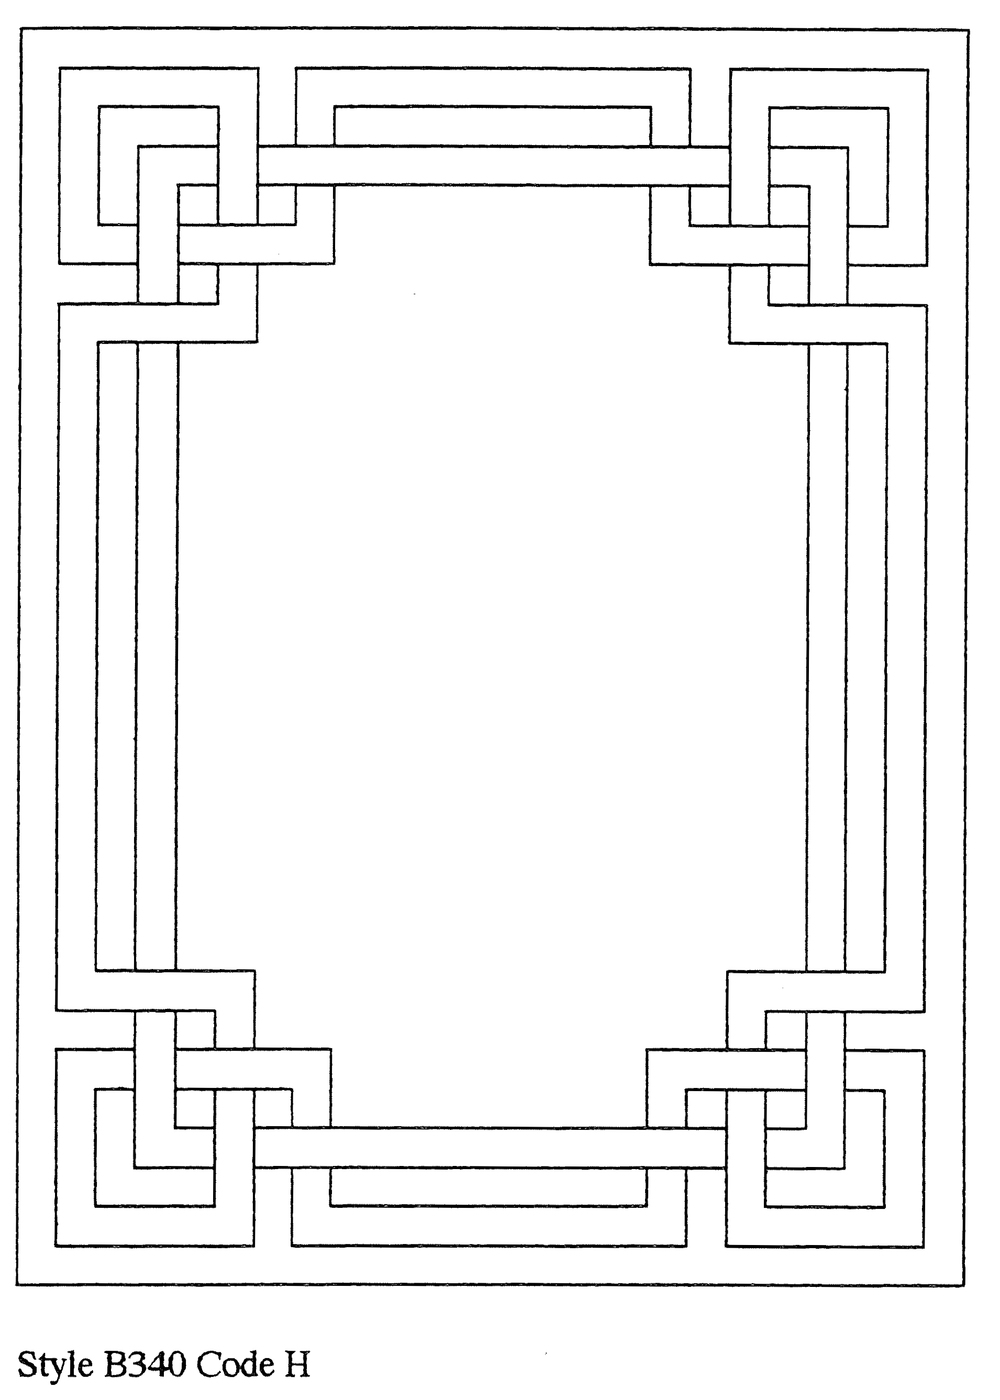 P2-B340.jpg